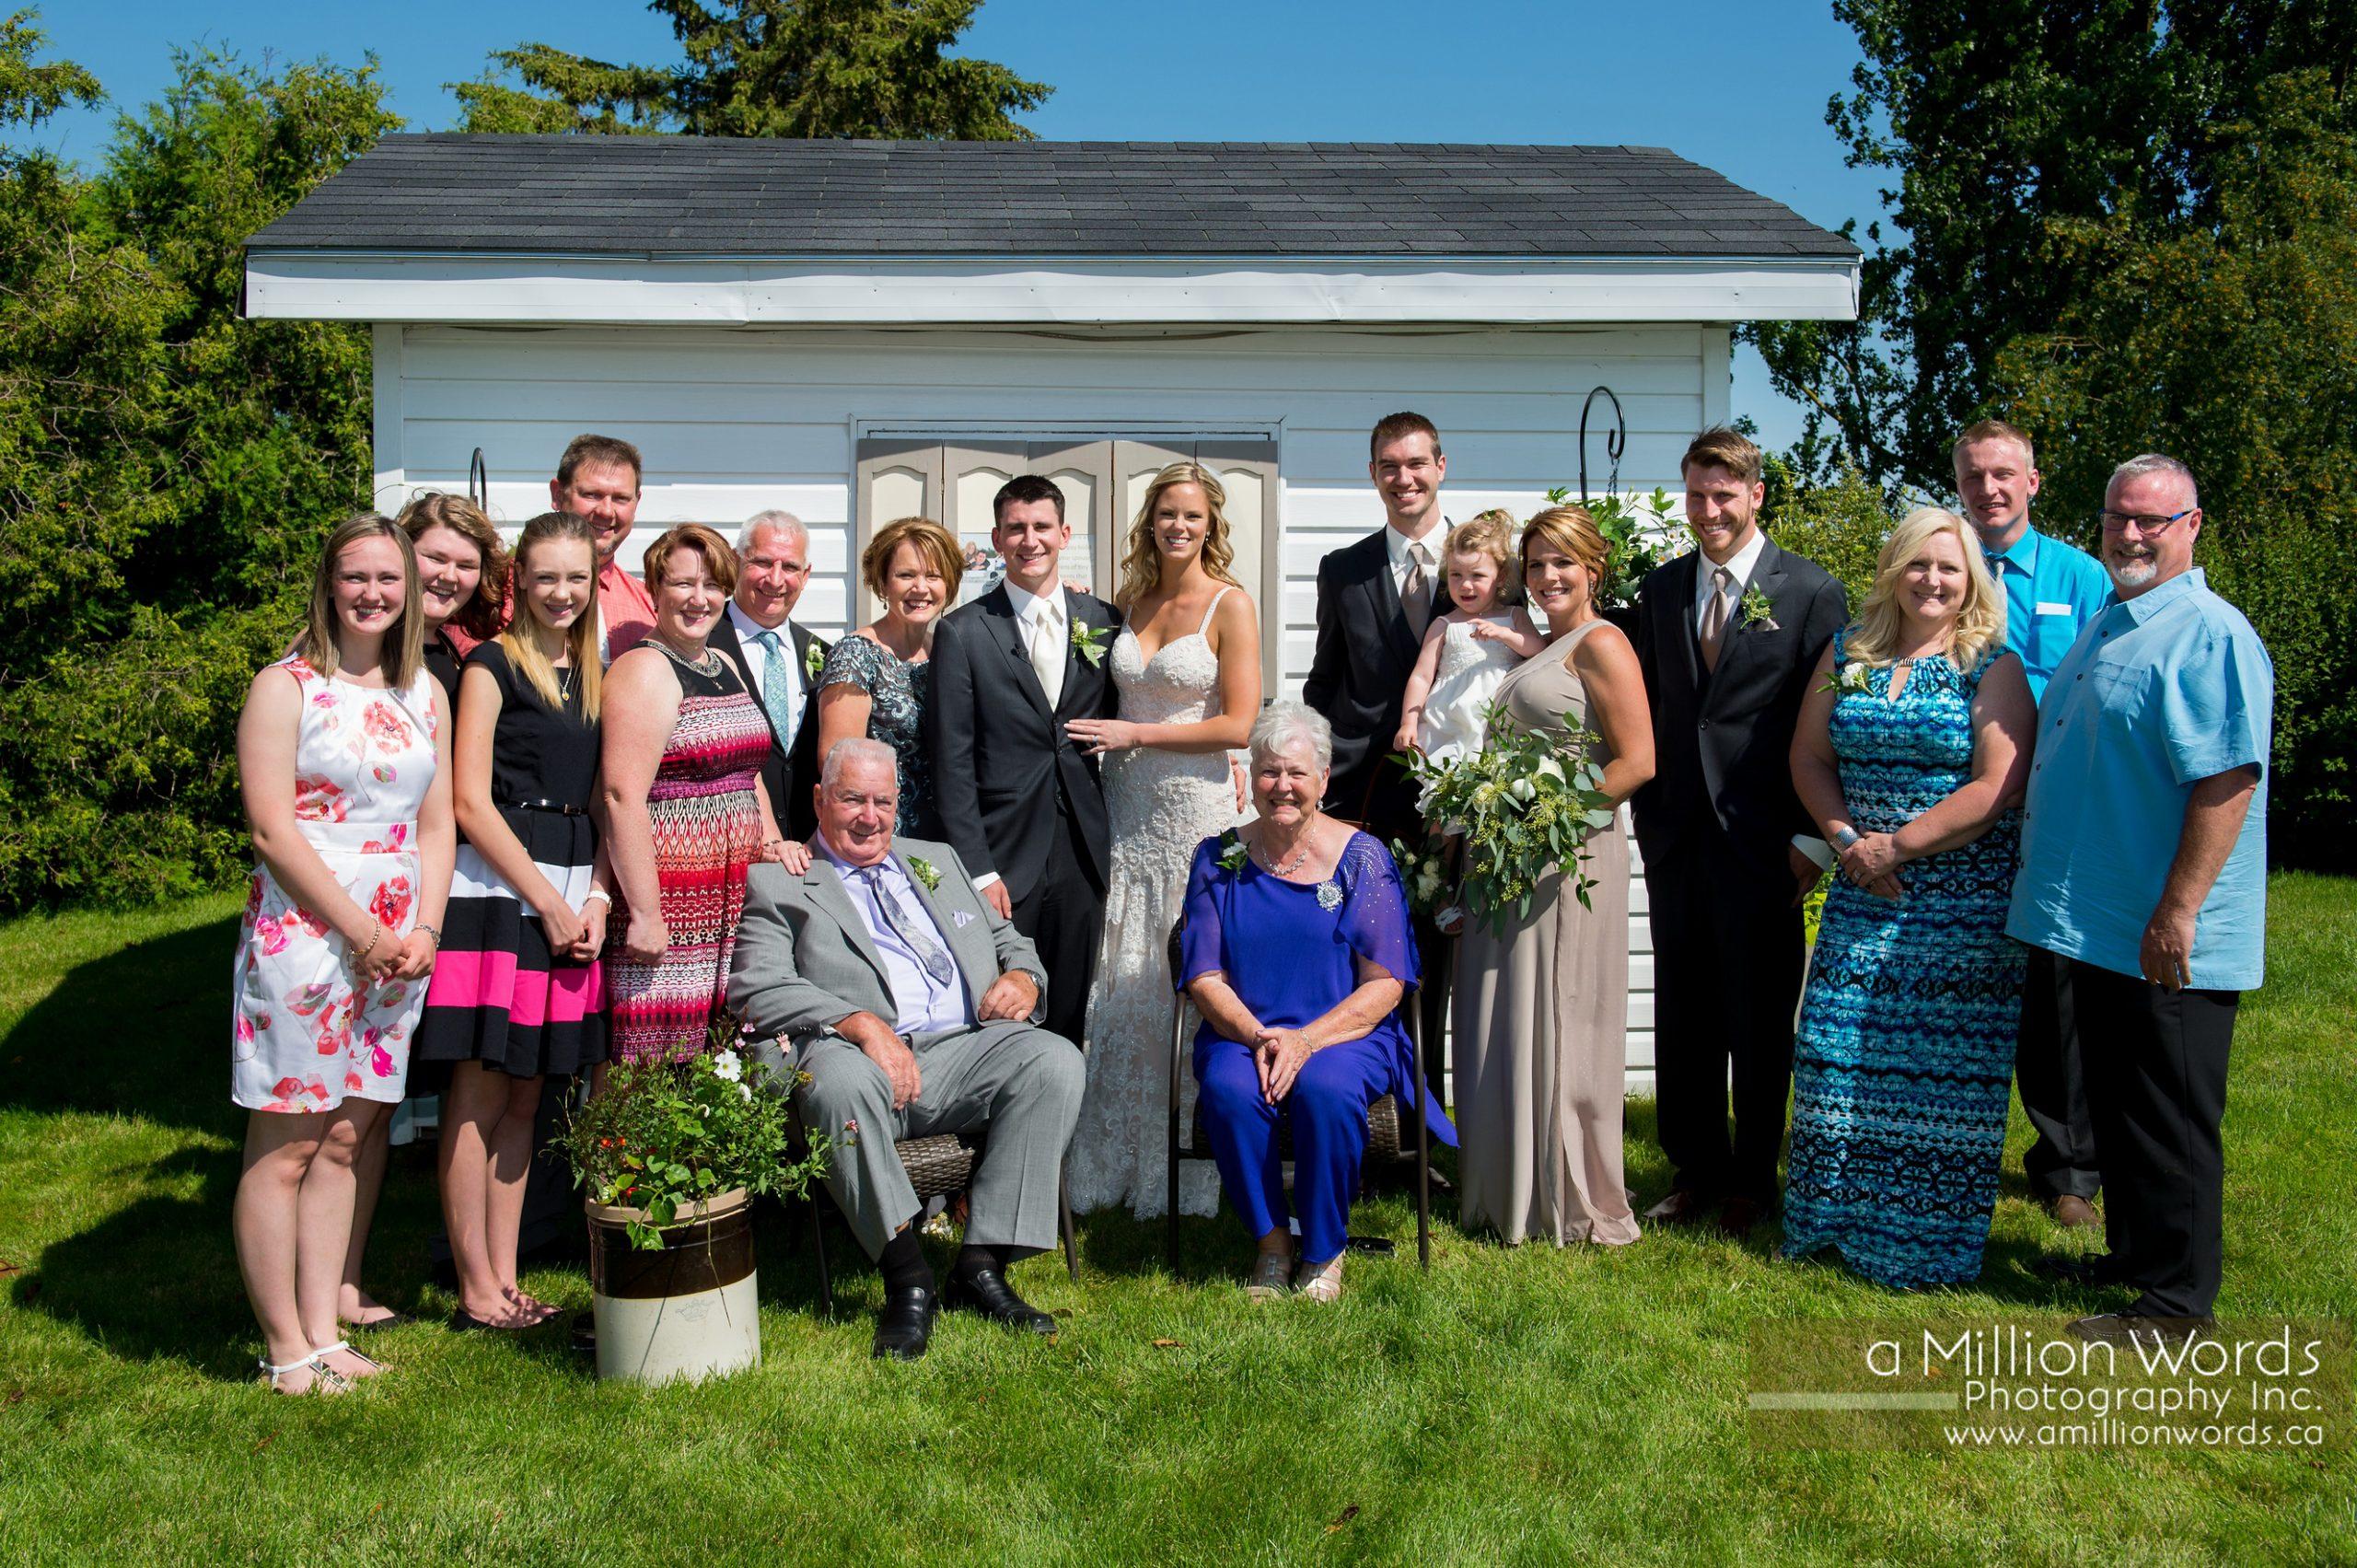 arthur_wedding_photographer42